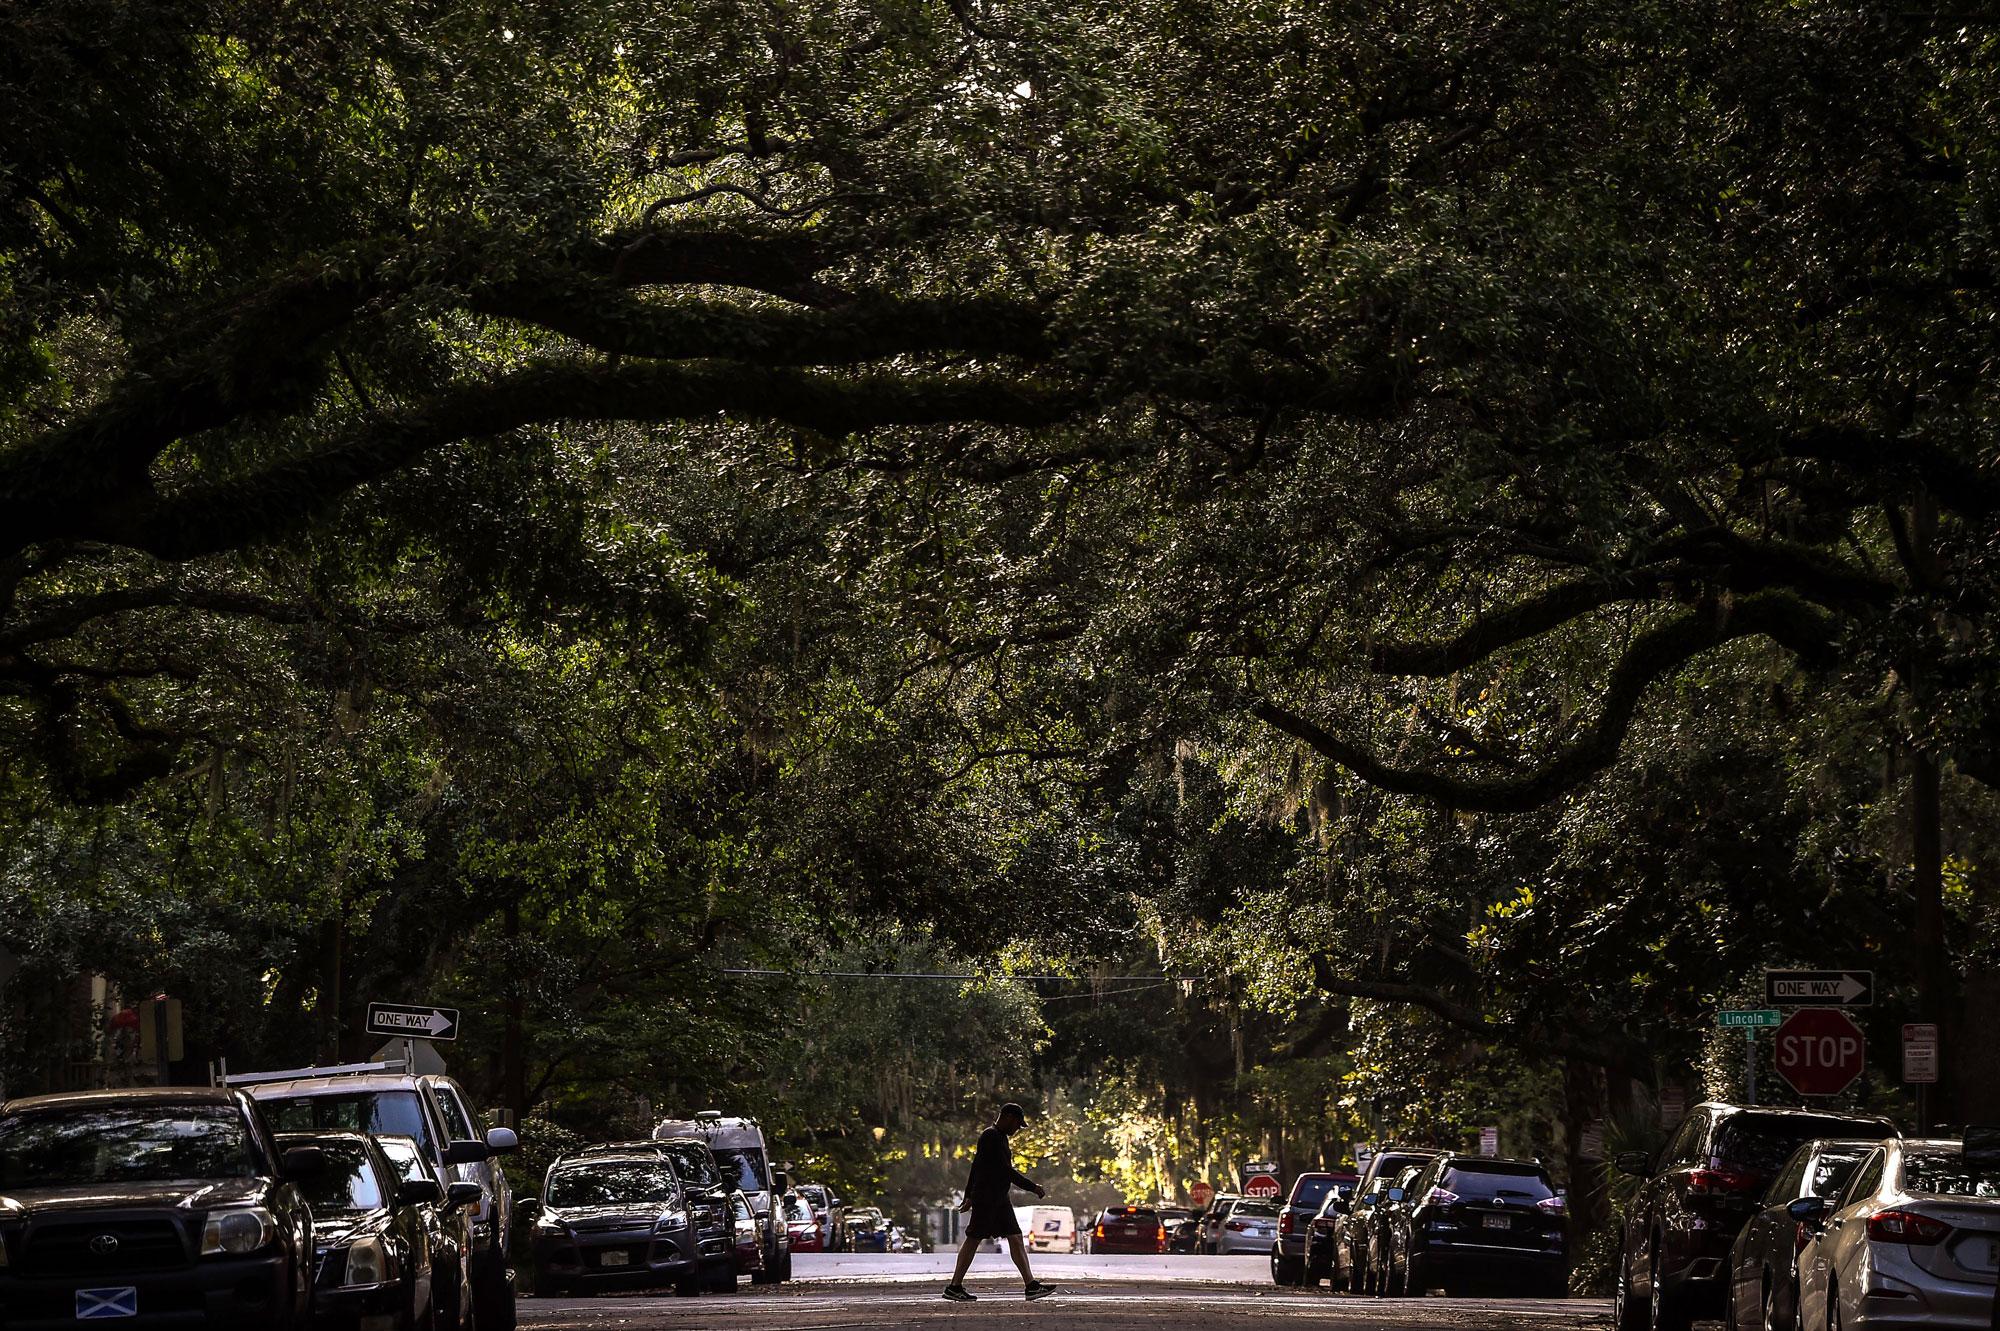 A man walks in the Historic District in Savannah, Georgia, on April 25.